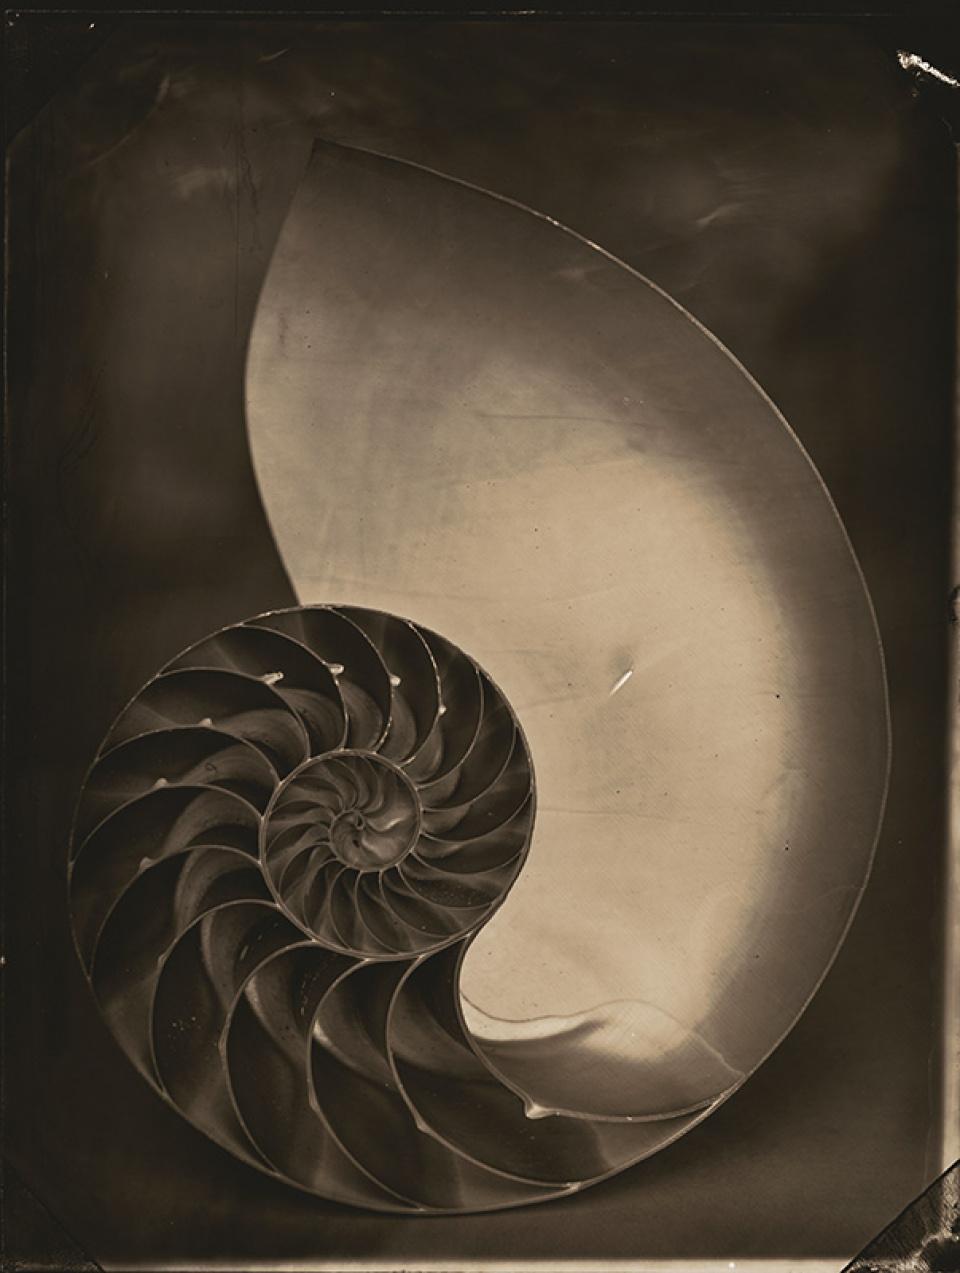 Tom Baril. Nautilus, 2001. Selenium toned gelatin silver print